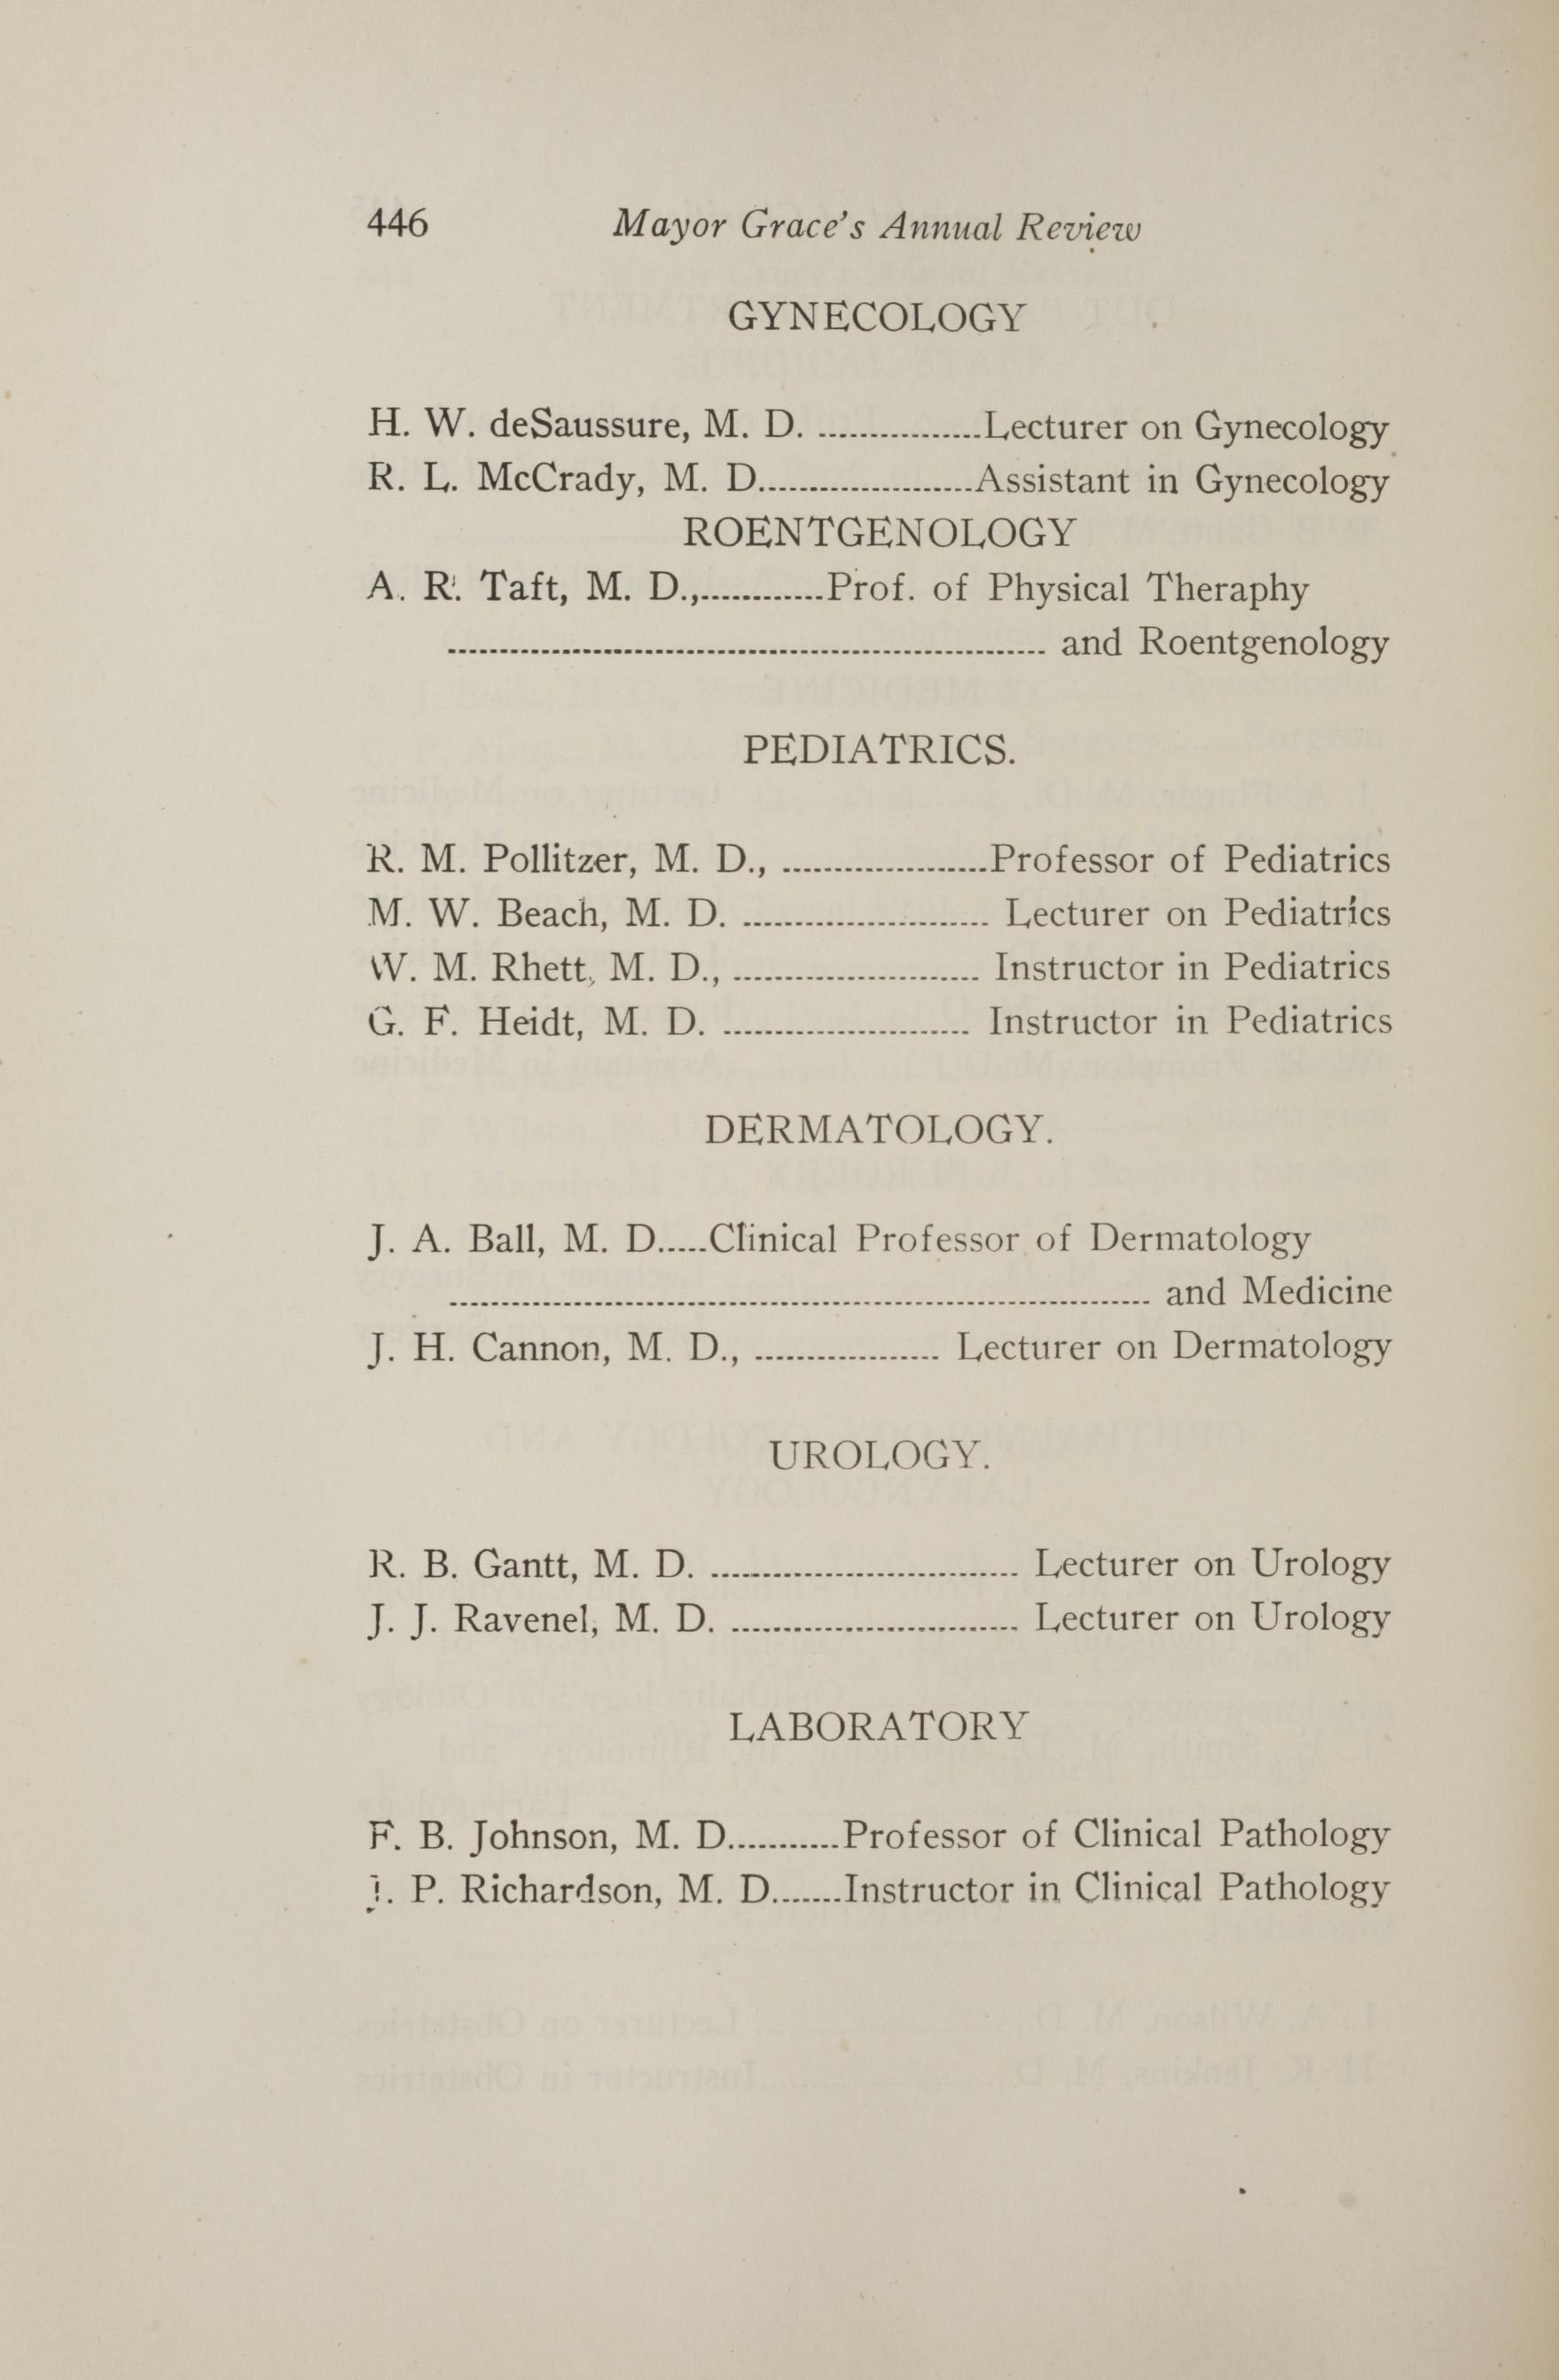 Charleston Yearbook, 1921, page 446